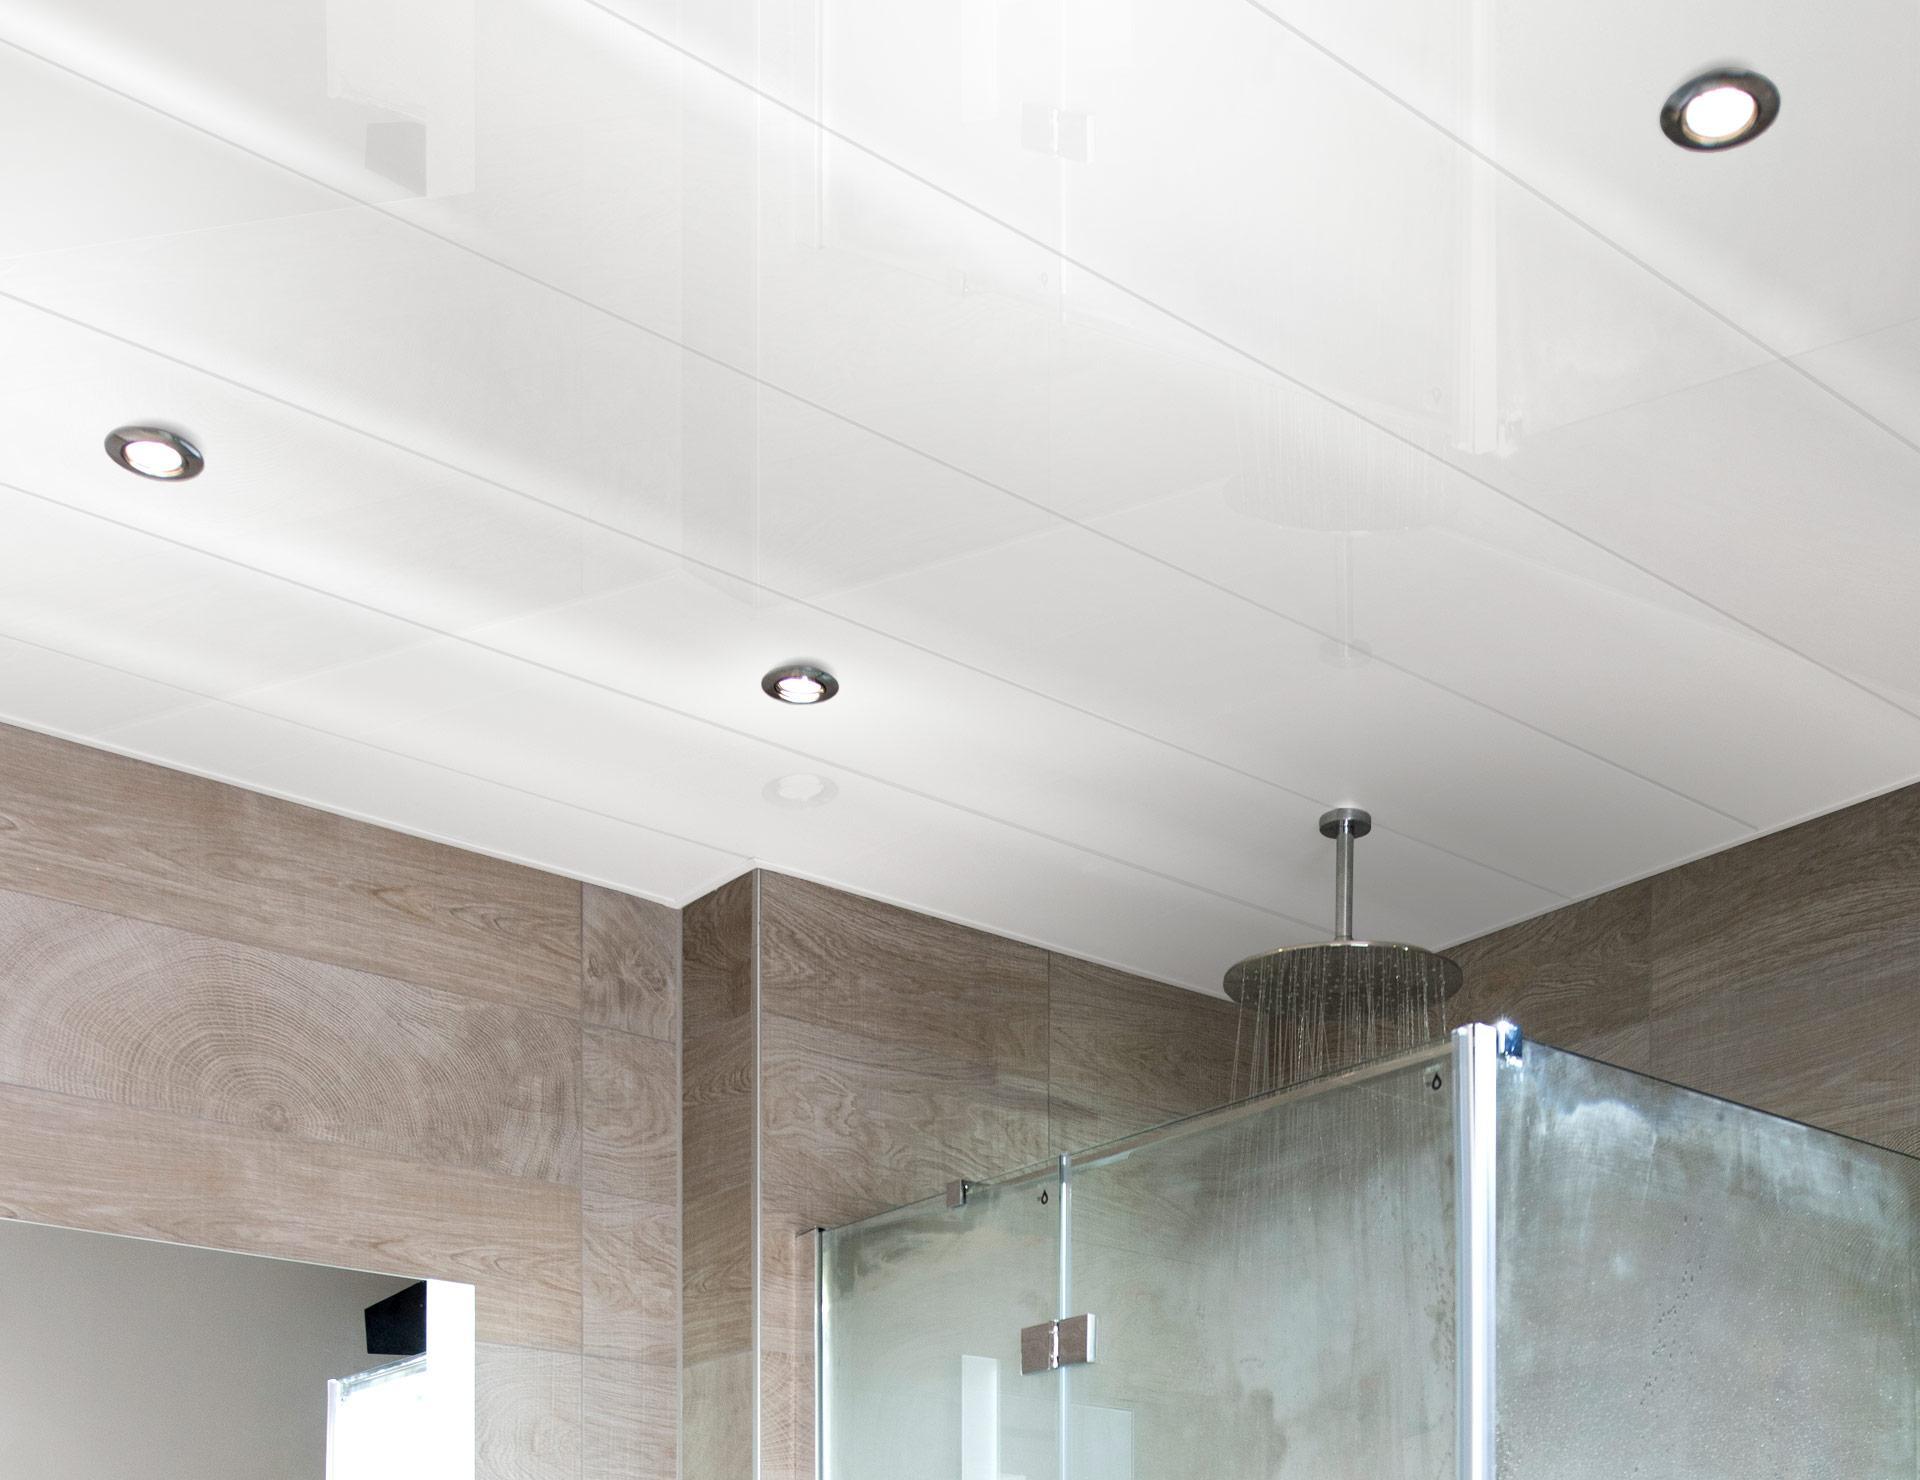 Aluminium Plafond Badkamer : Luxalon plafond type largo u bekijk dit product